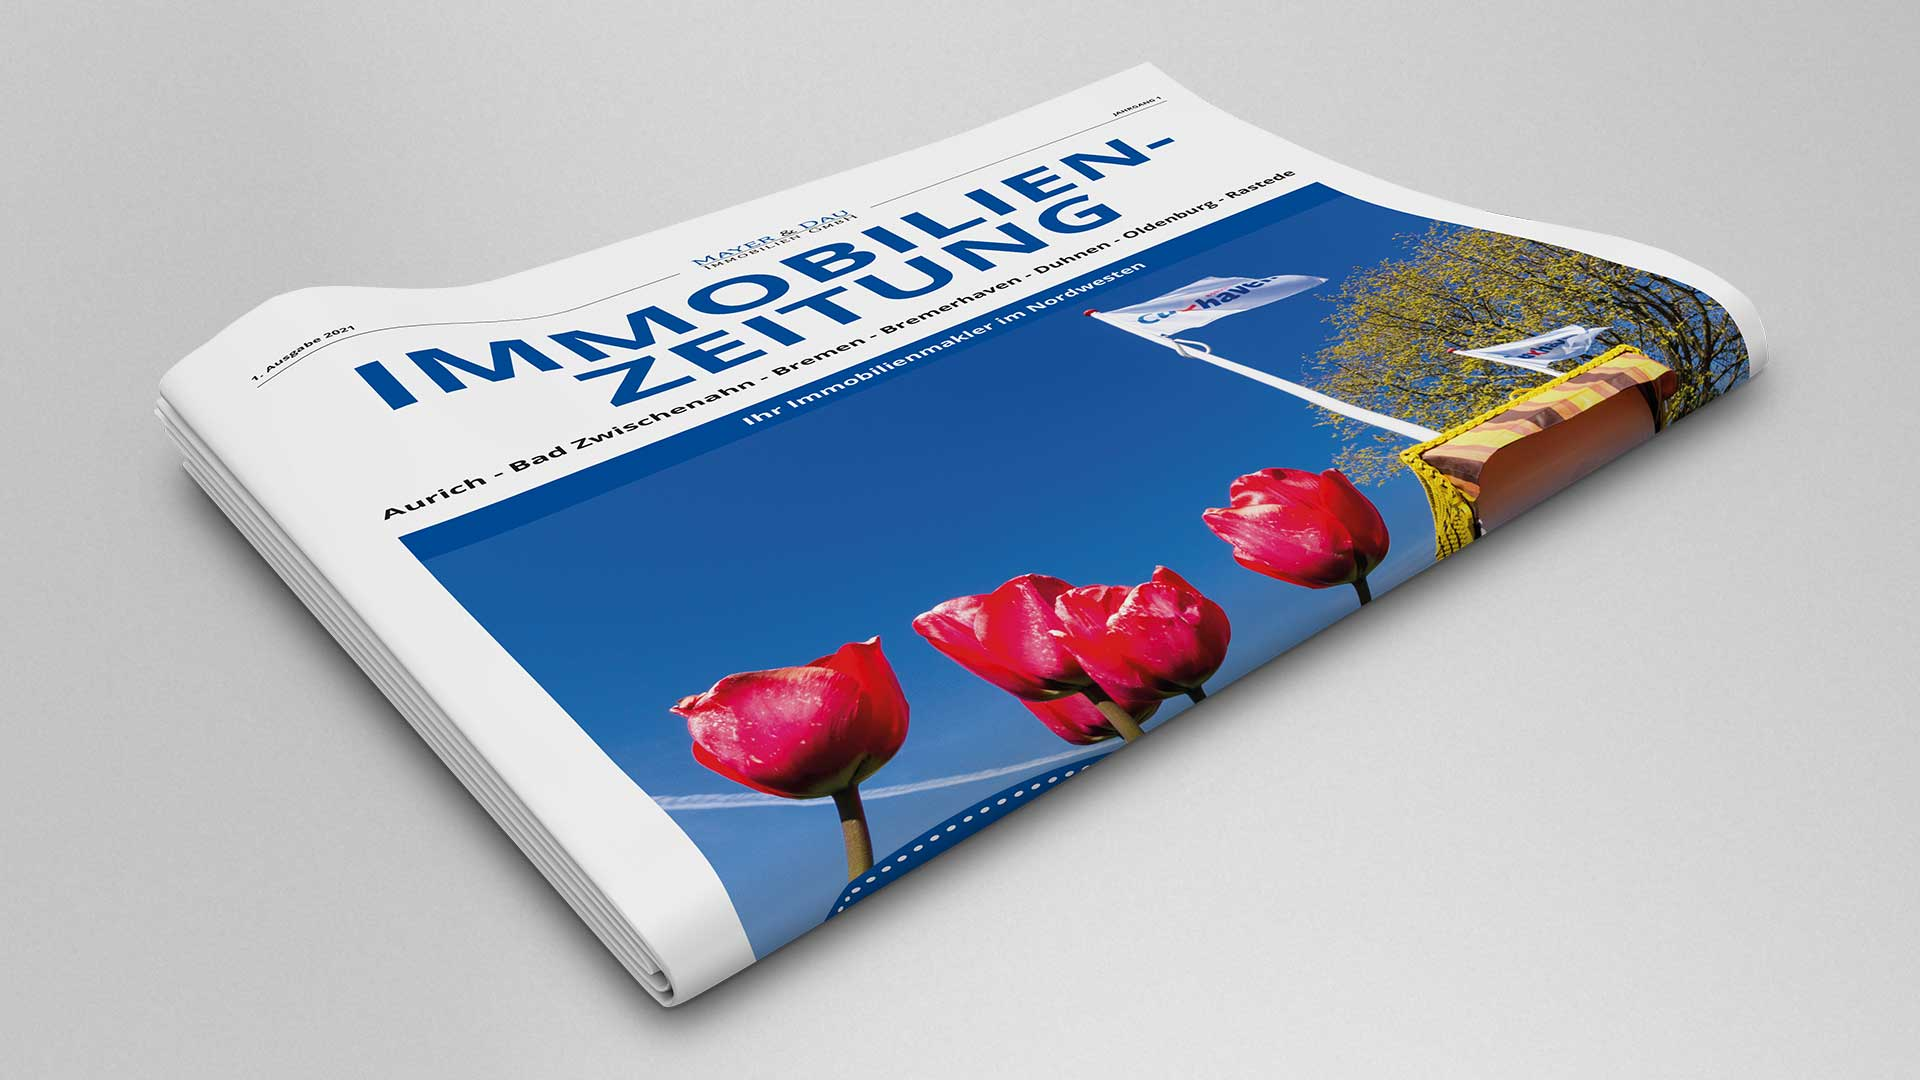 M&D_Immobilienzeitung__Ausgabe_1